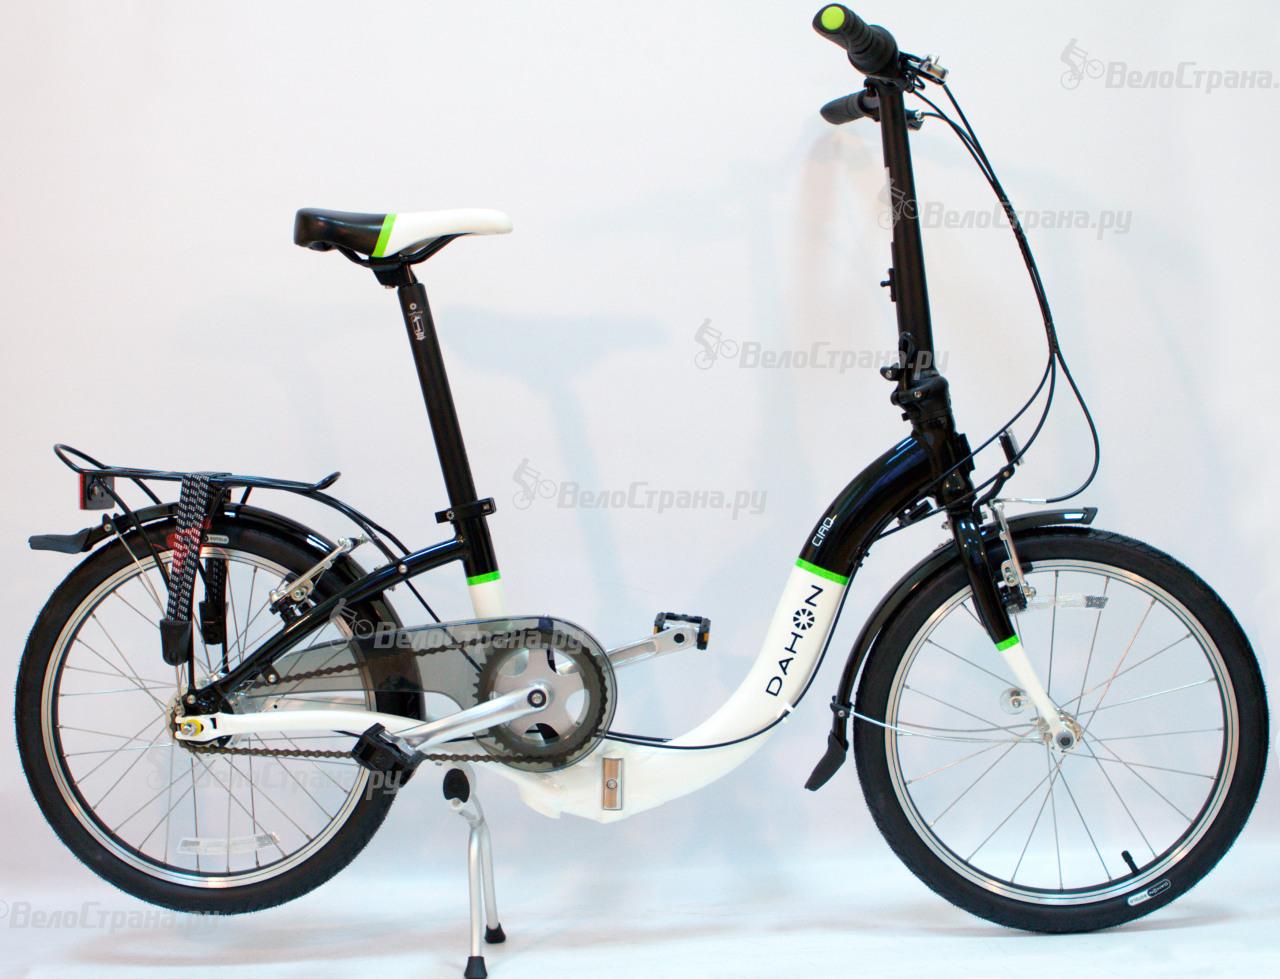 Велосипед Dahon Ciao i7 (2015) велосипед dahon vybe d7 u 2017